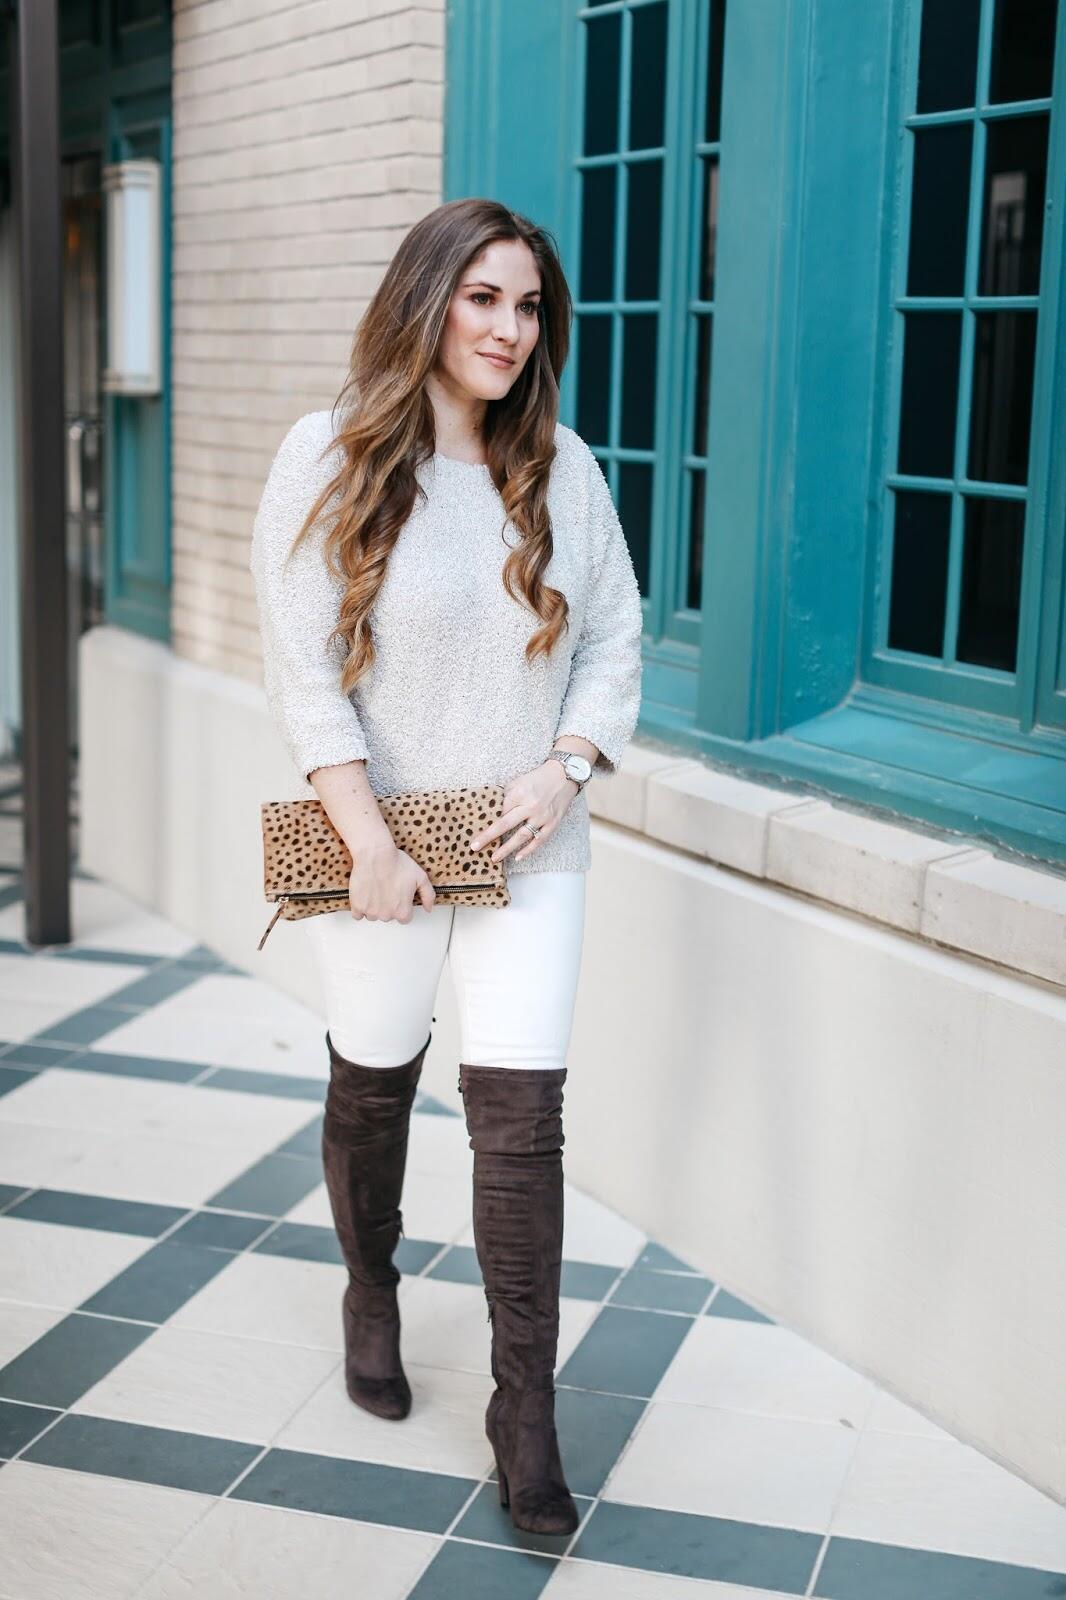 3 ways to wear winter white jeans